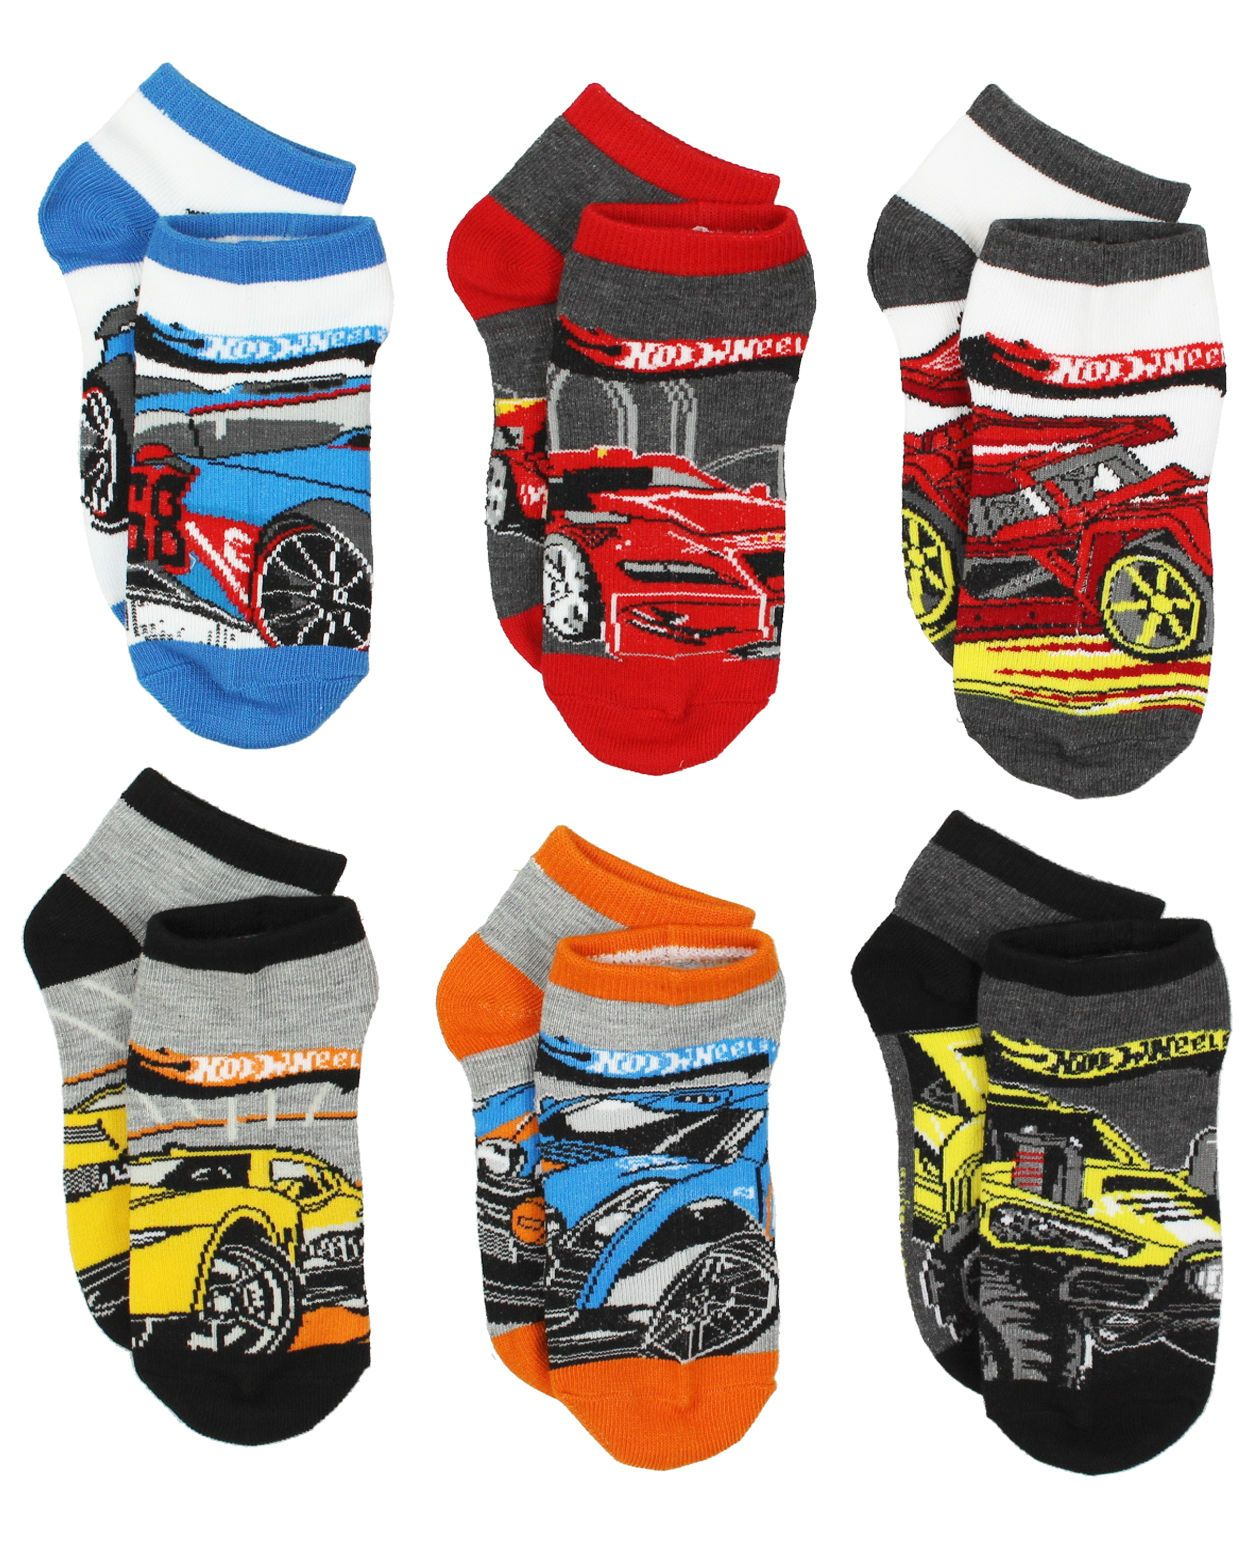 e1fcb0c26 $12.99 - Hot Wheels Boys 6 Pack Socks (Little Kid/Big Kid) Hw005Bqs #ebay  #Fashion